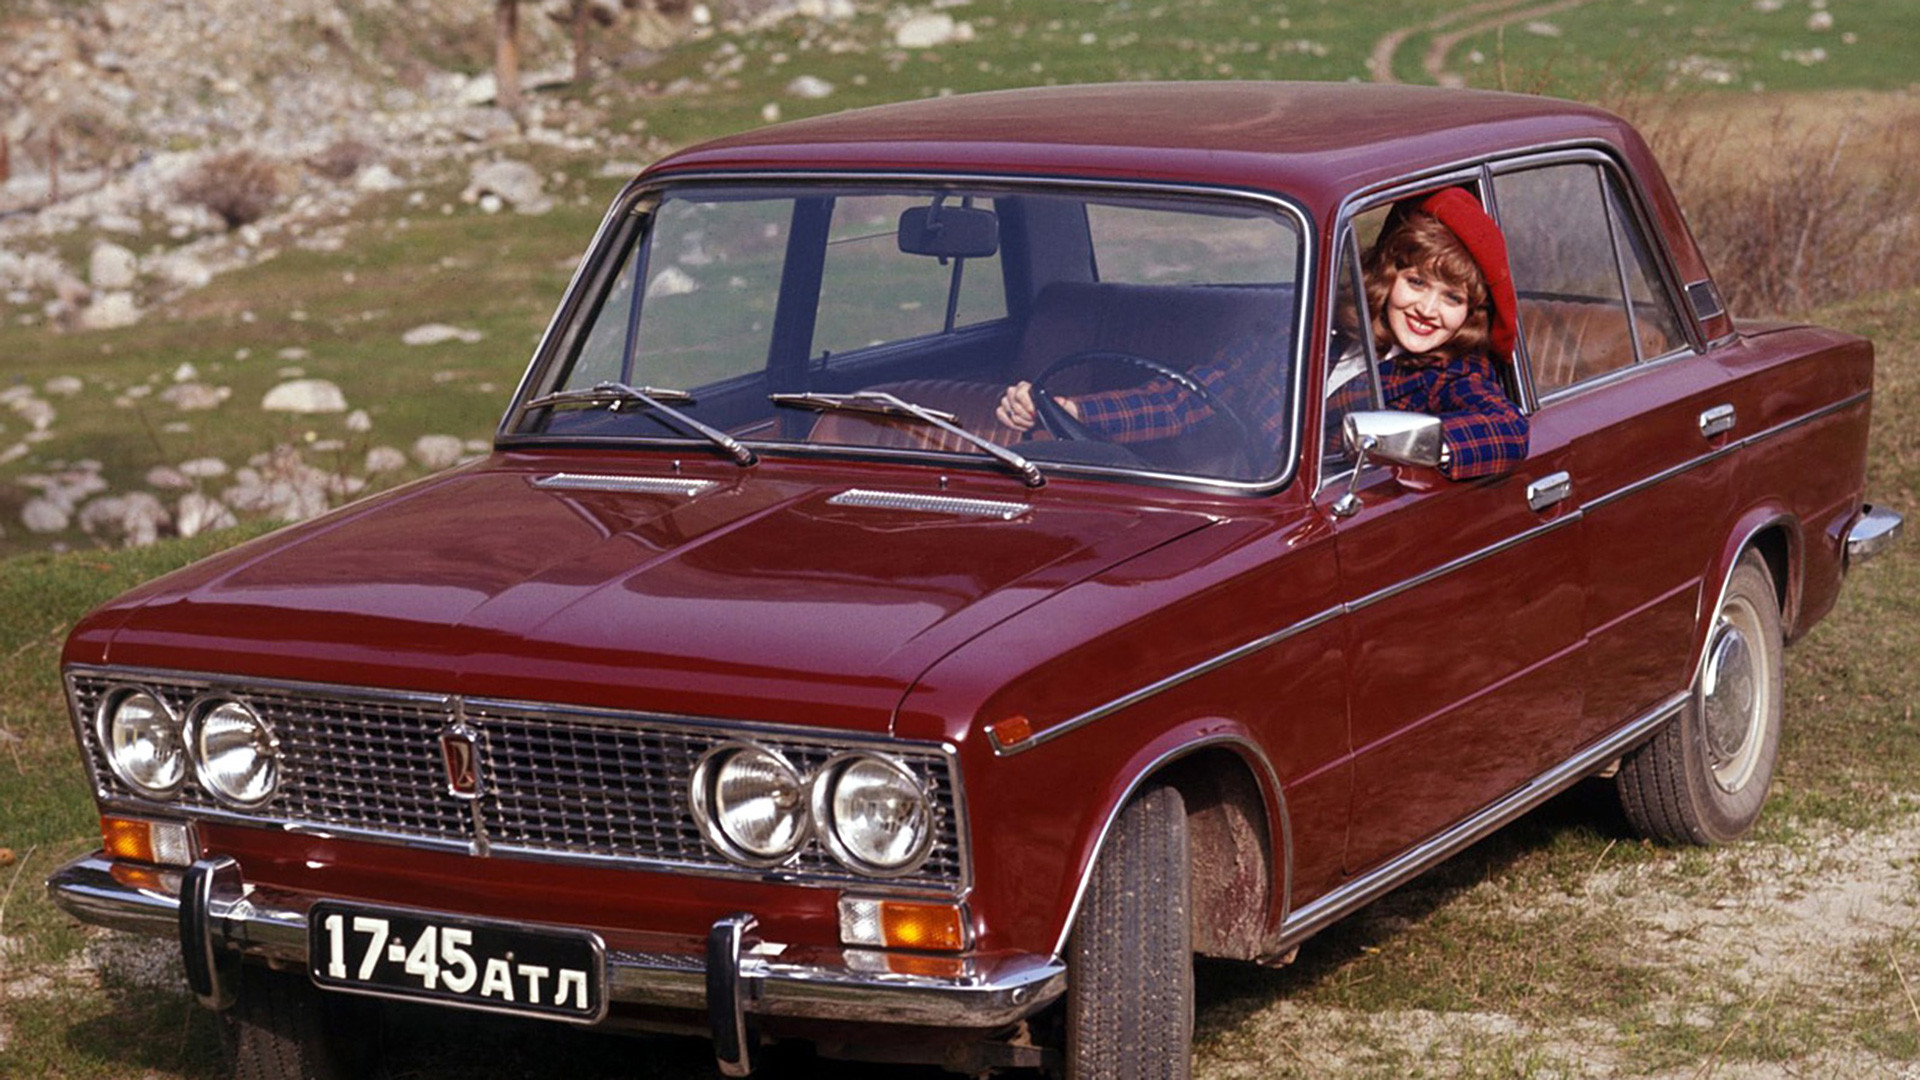 La berline Lada 2103, inspirée de la Fiat 124. À l'export, elle a reçu le nom de Lada 1500.